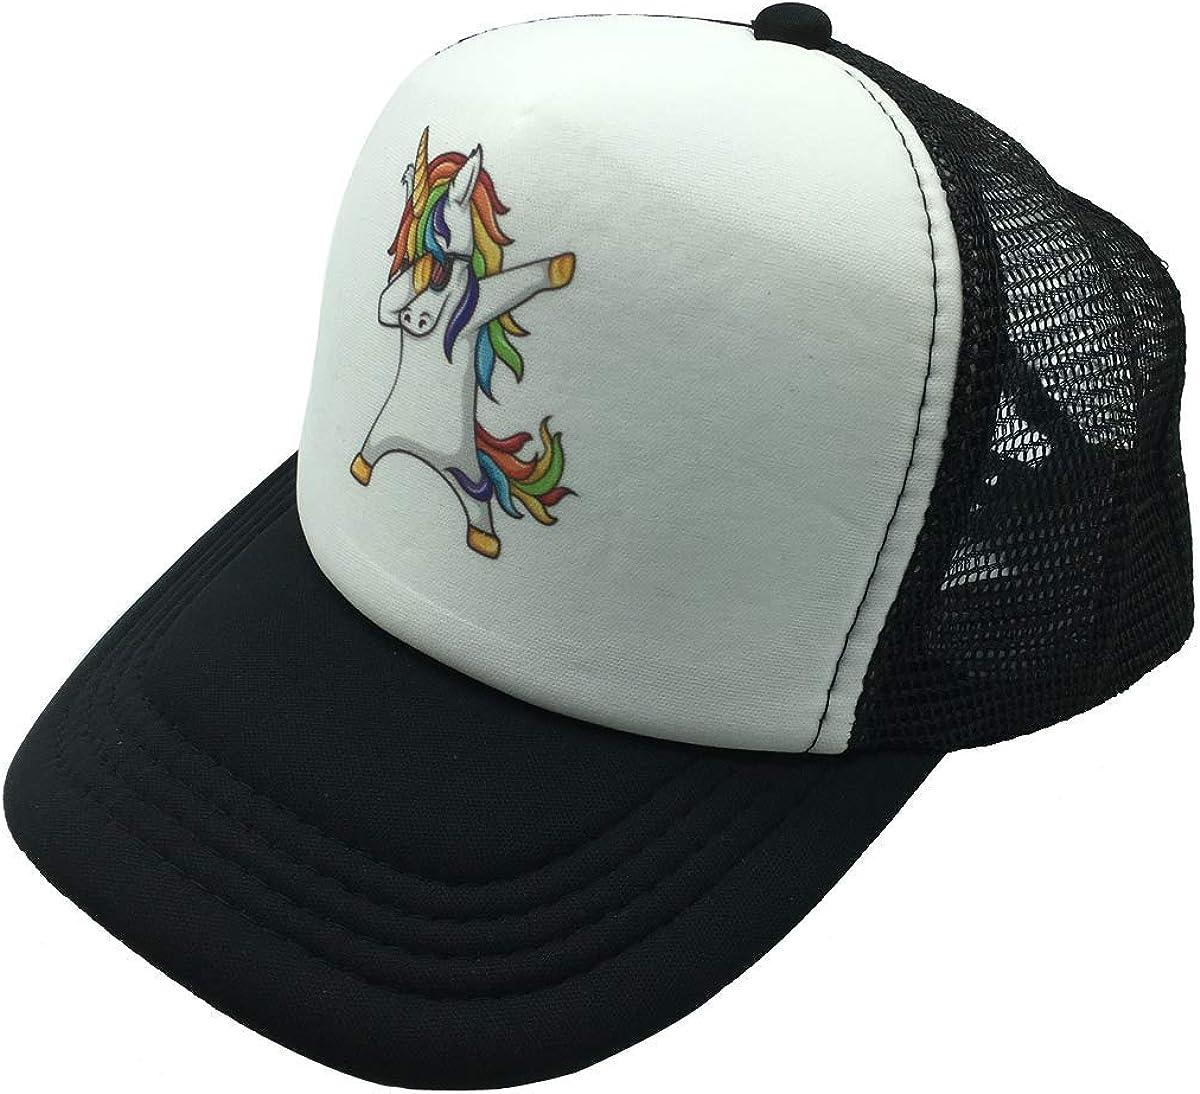 NVJUI JUFOPL Boys and Girls Kids Baseball Cap Mesh Back Snapback Trucker Hats